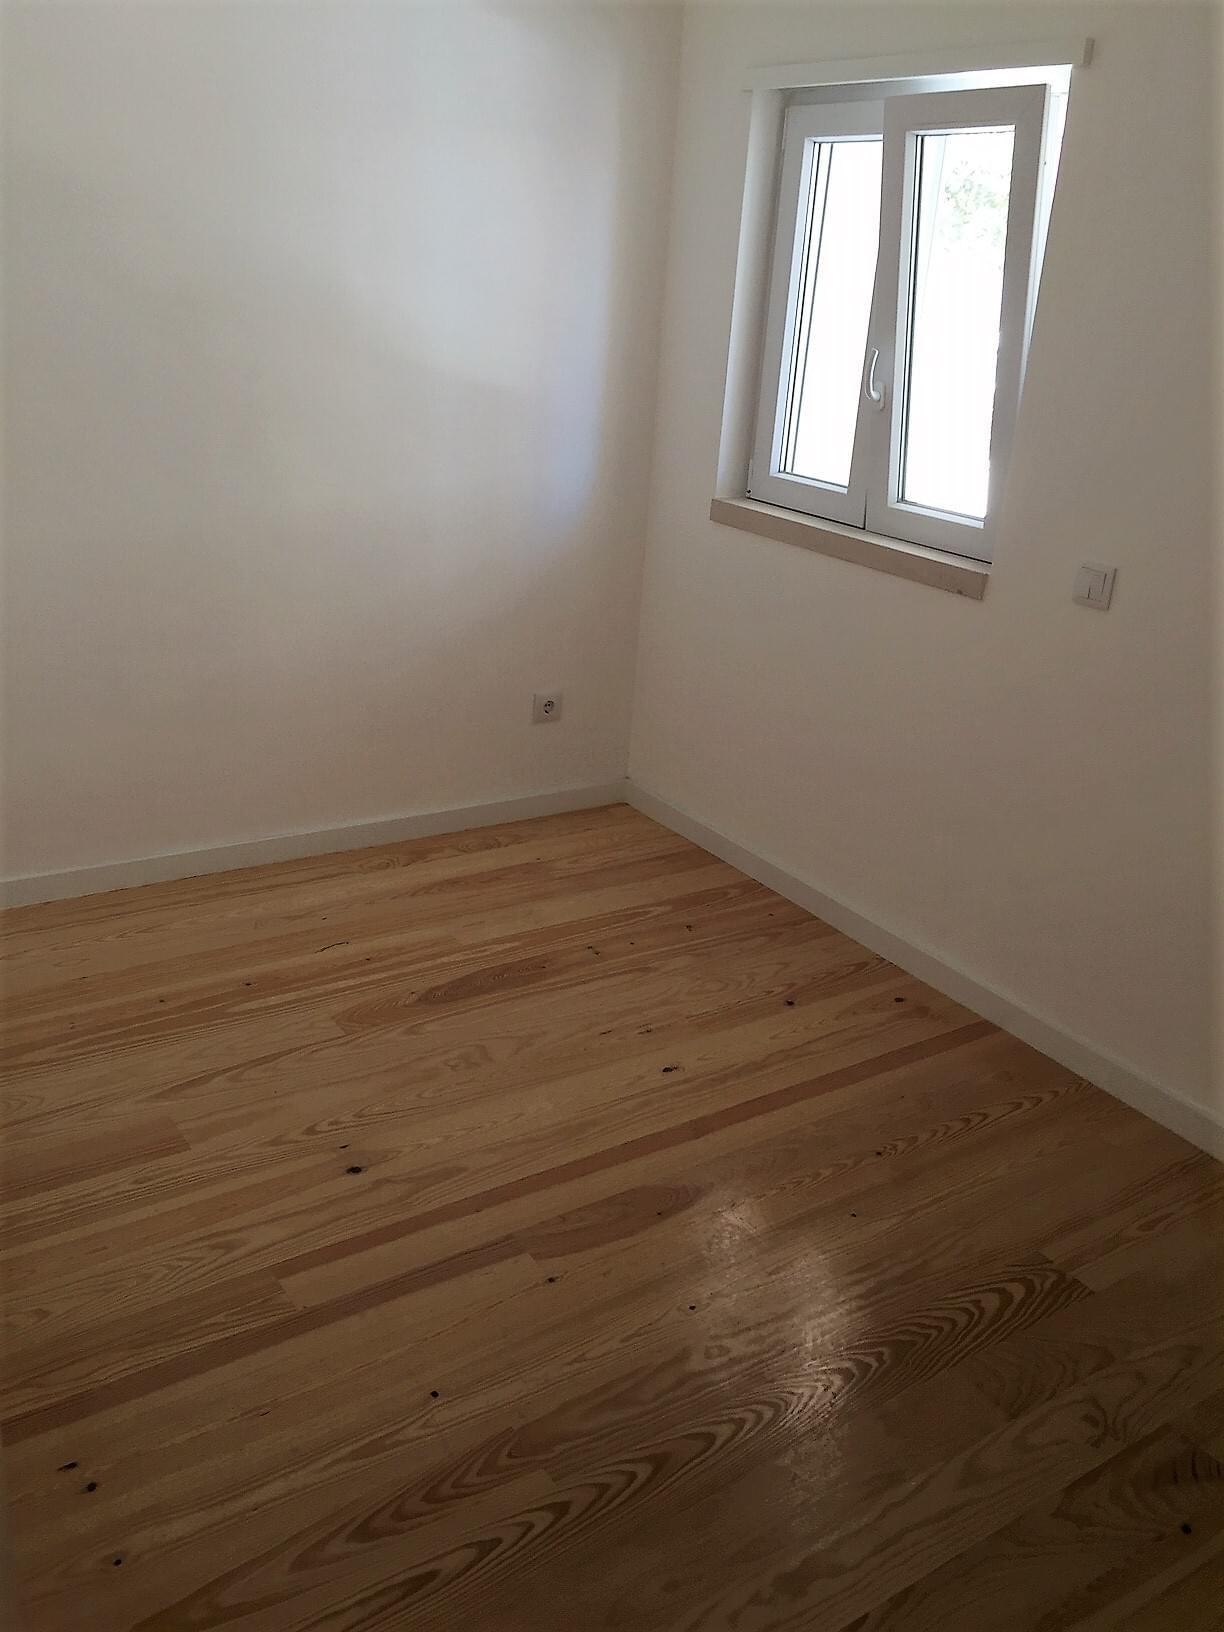 pf18802-apartamento-t1-lisboa-fee7aca4-03ac-430b-8634-123ca67f0e17